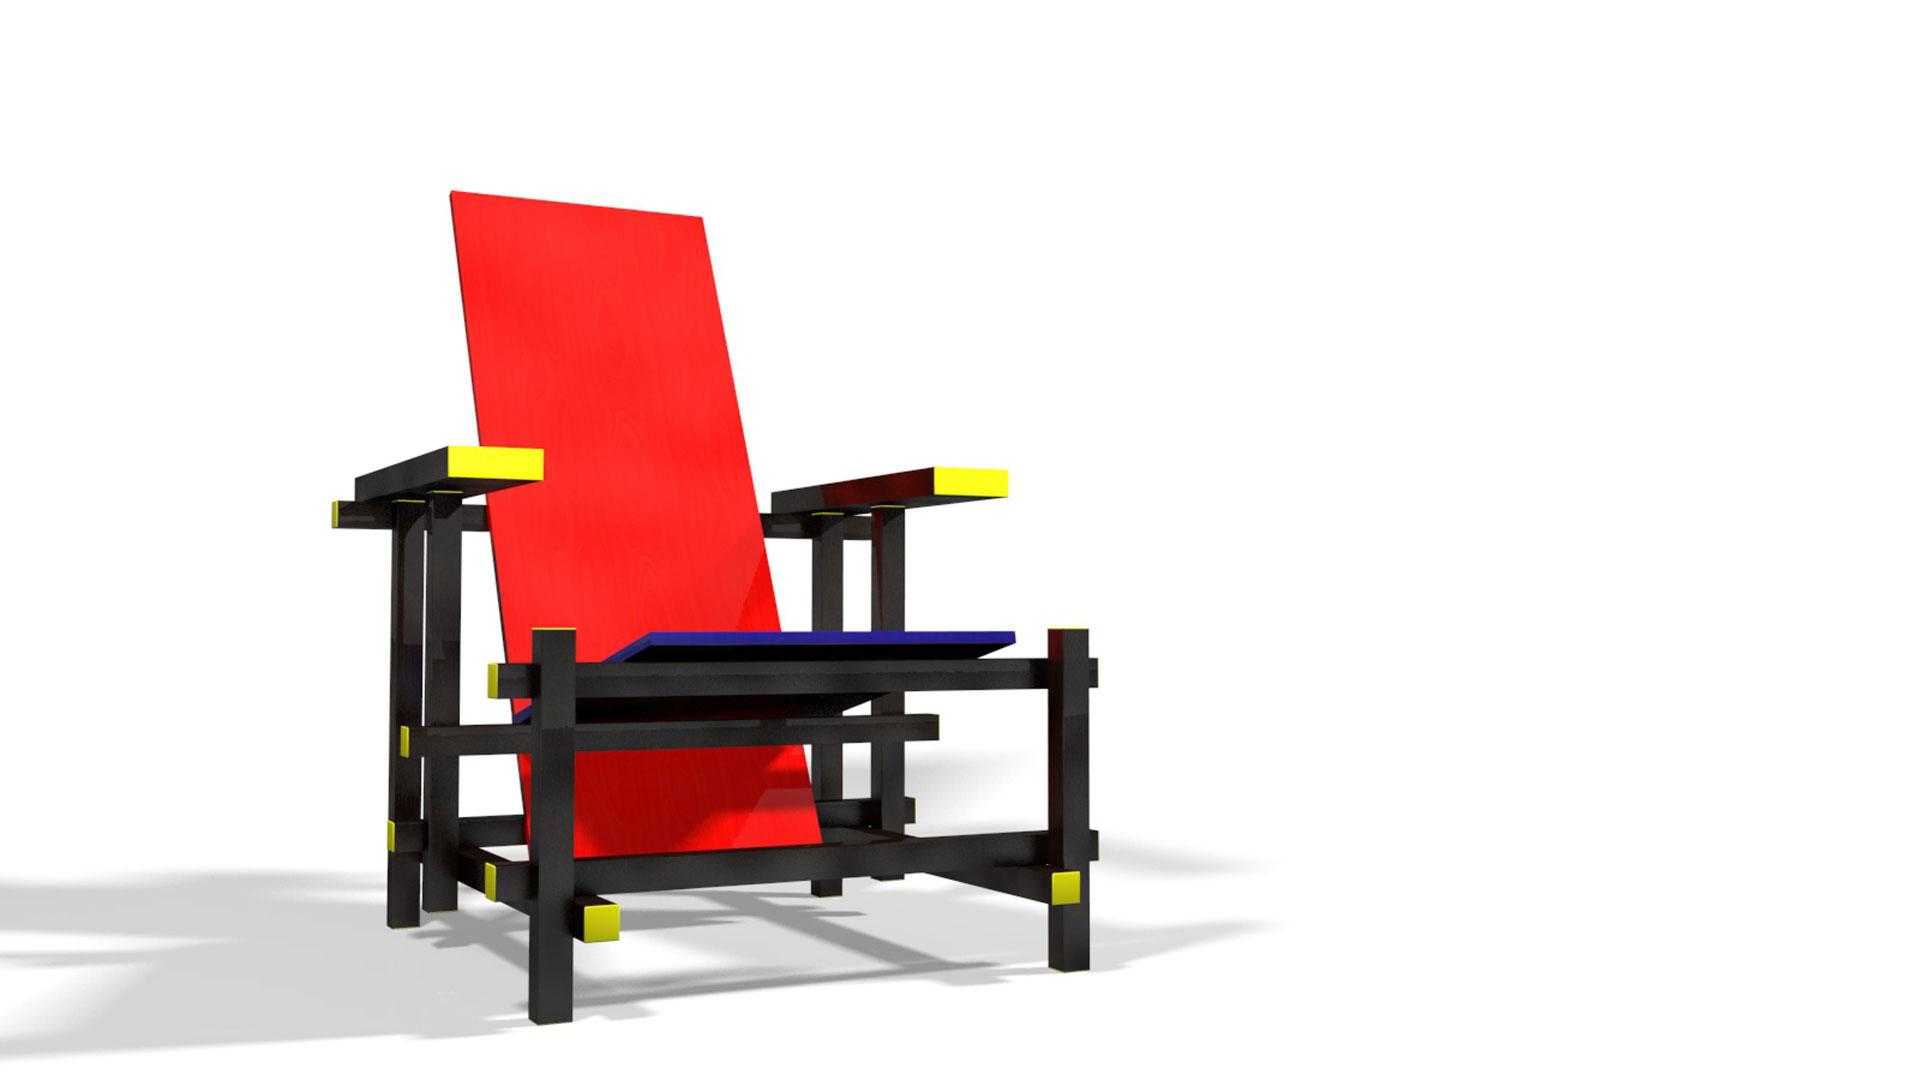 arnaud gaudin designer d 39 espace concepteur etudiant en architecture. Black Bedroom Furniture Sets. Home Design Ideas